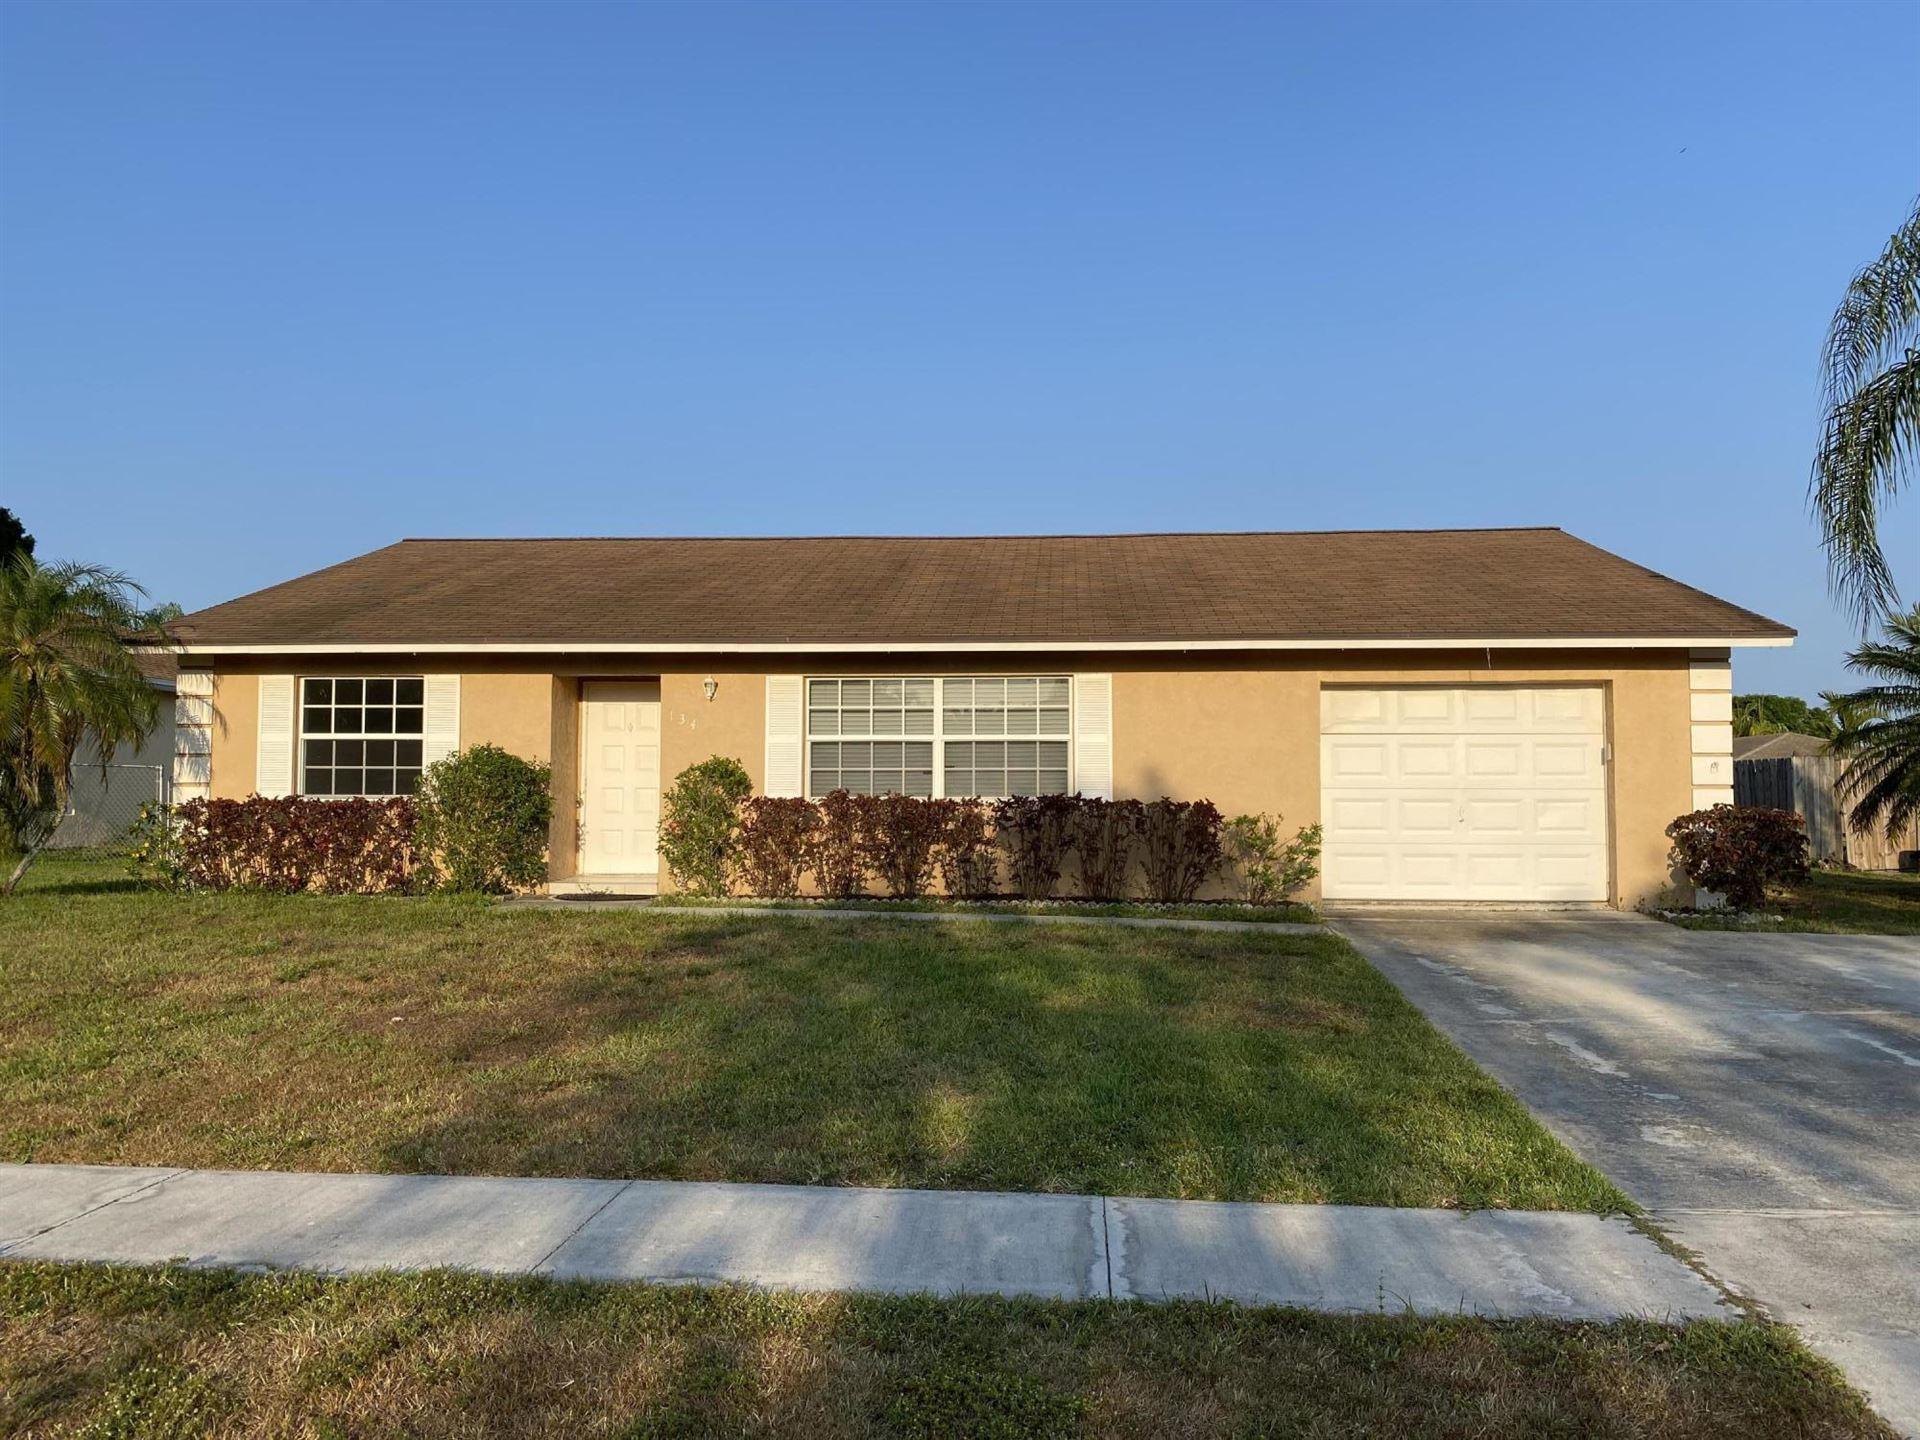 134 Cortes Avenue, Royal Palm Beach, FL 33411 - #: RX-10684372